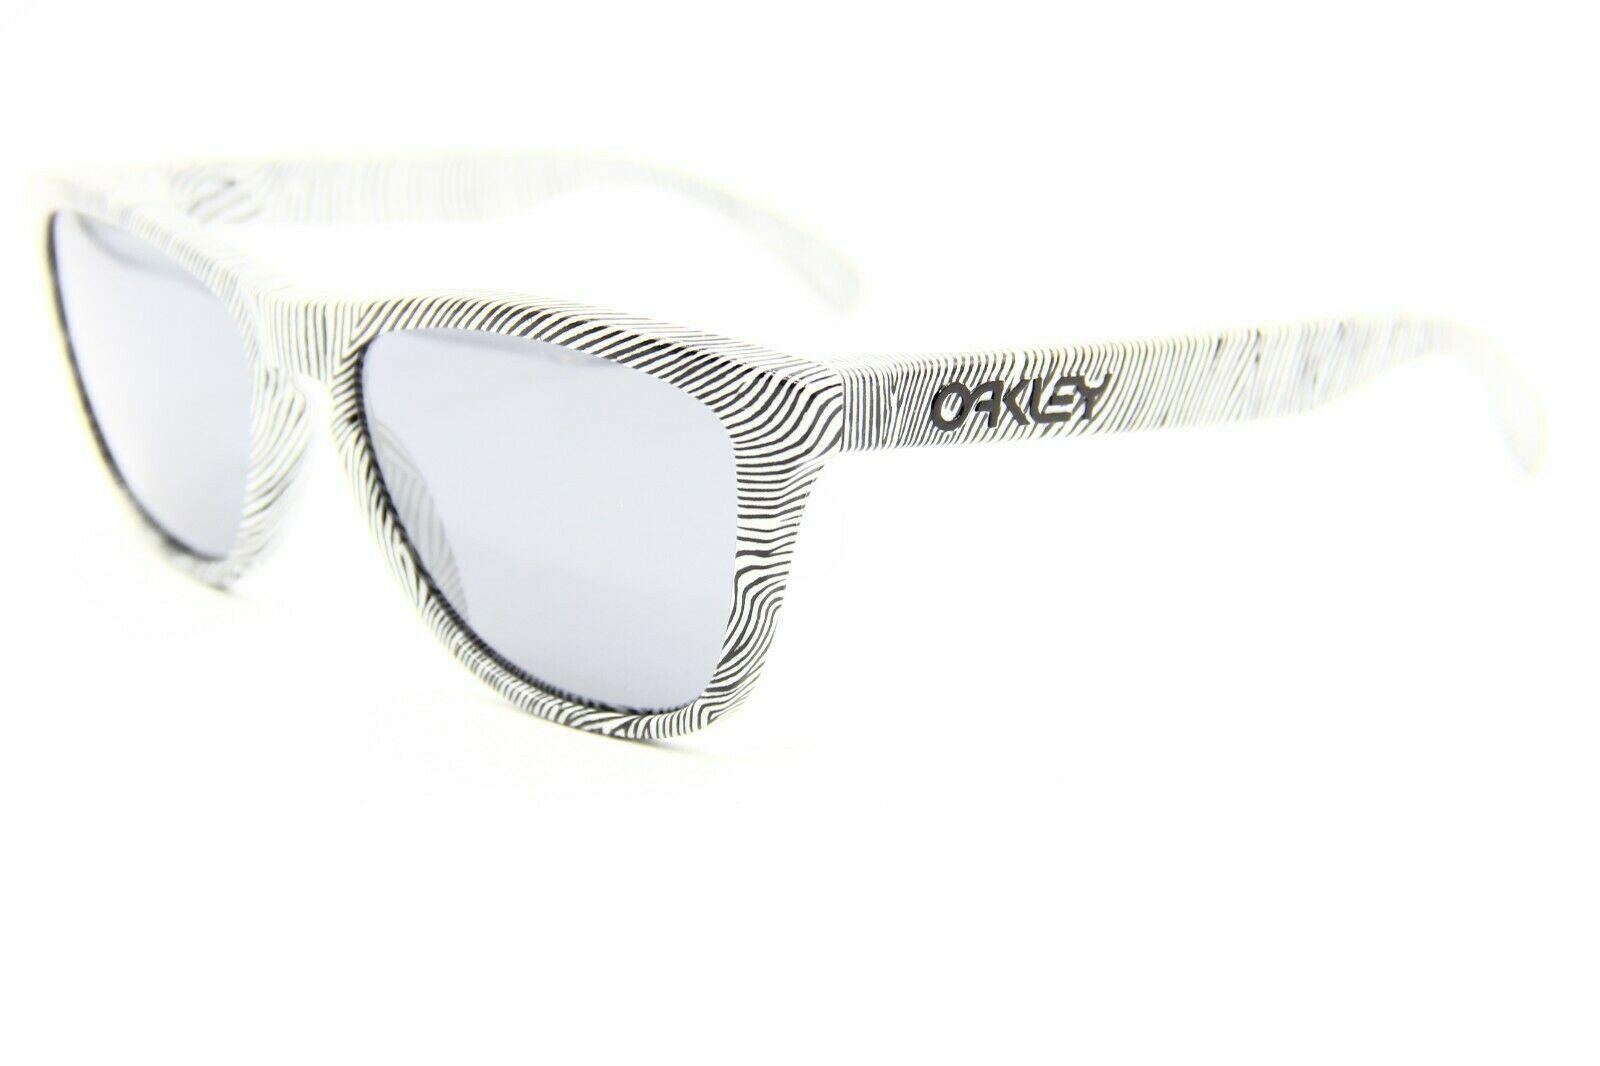 OAKLEY SANCTUARY OO9013-52 WHITE SUNGLASSES FRAME 55-17